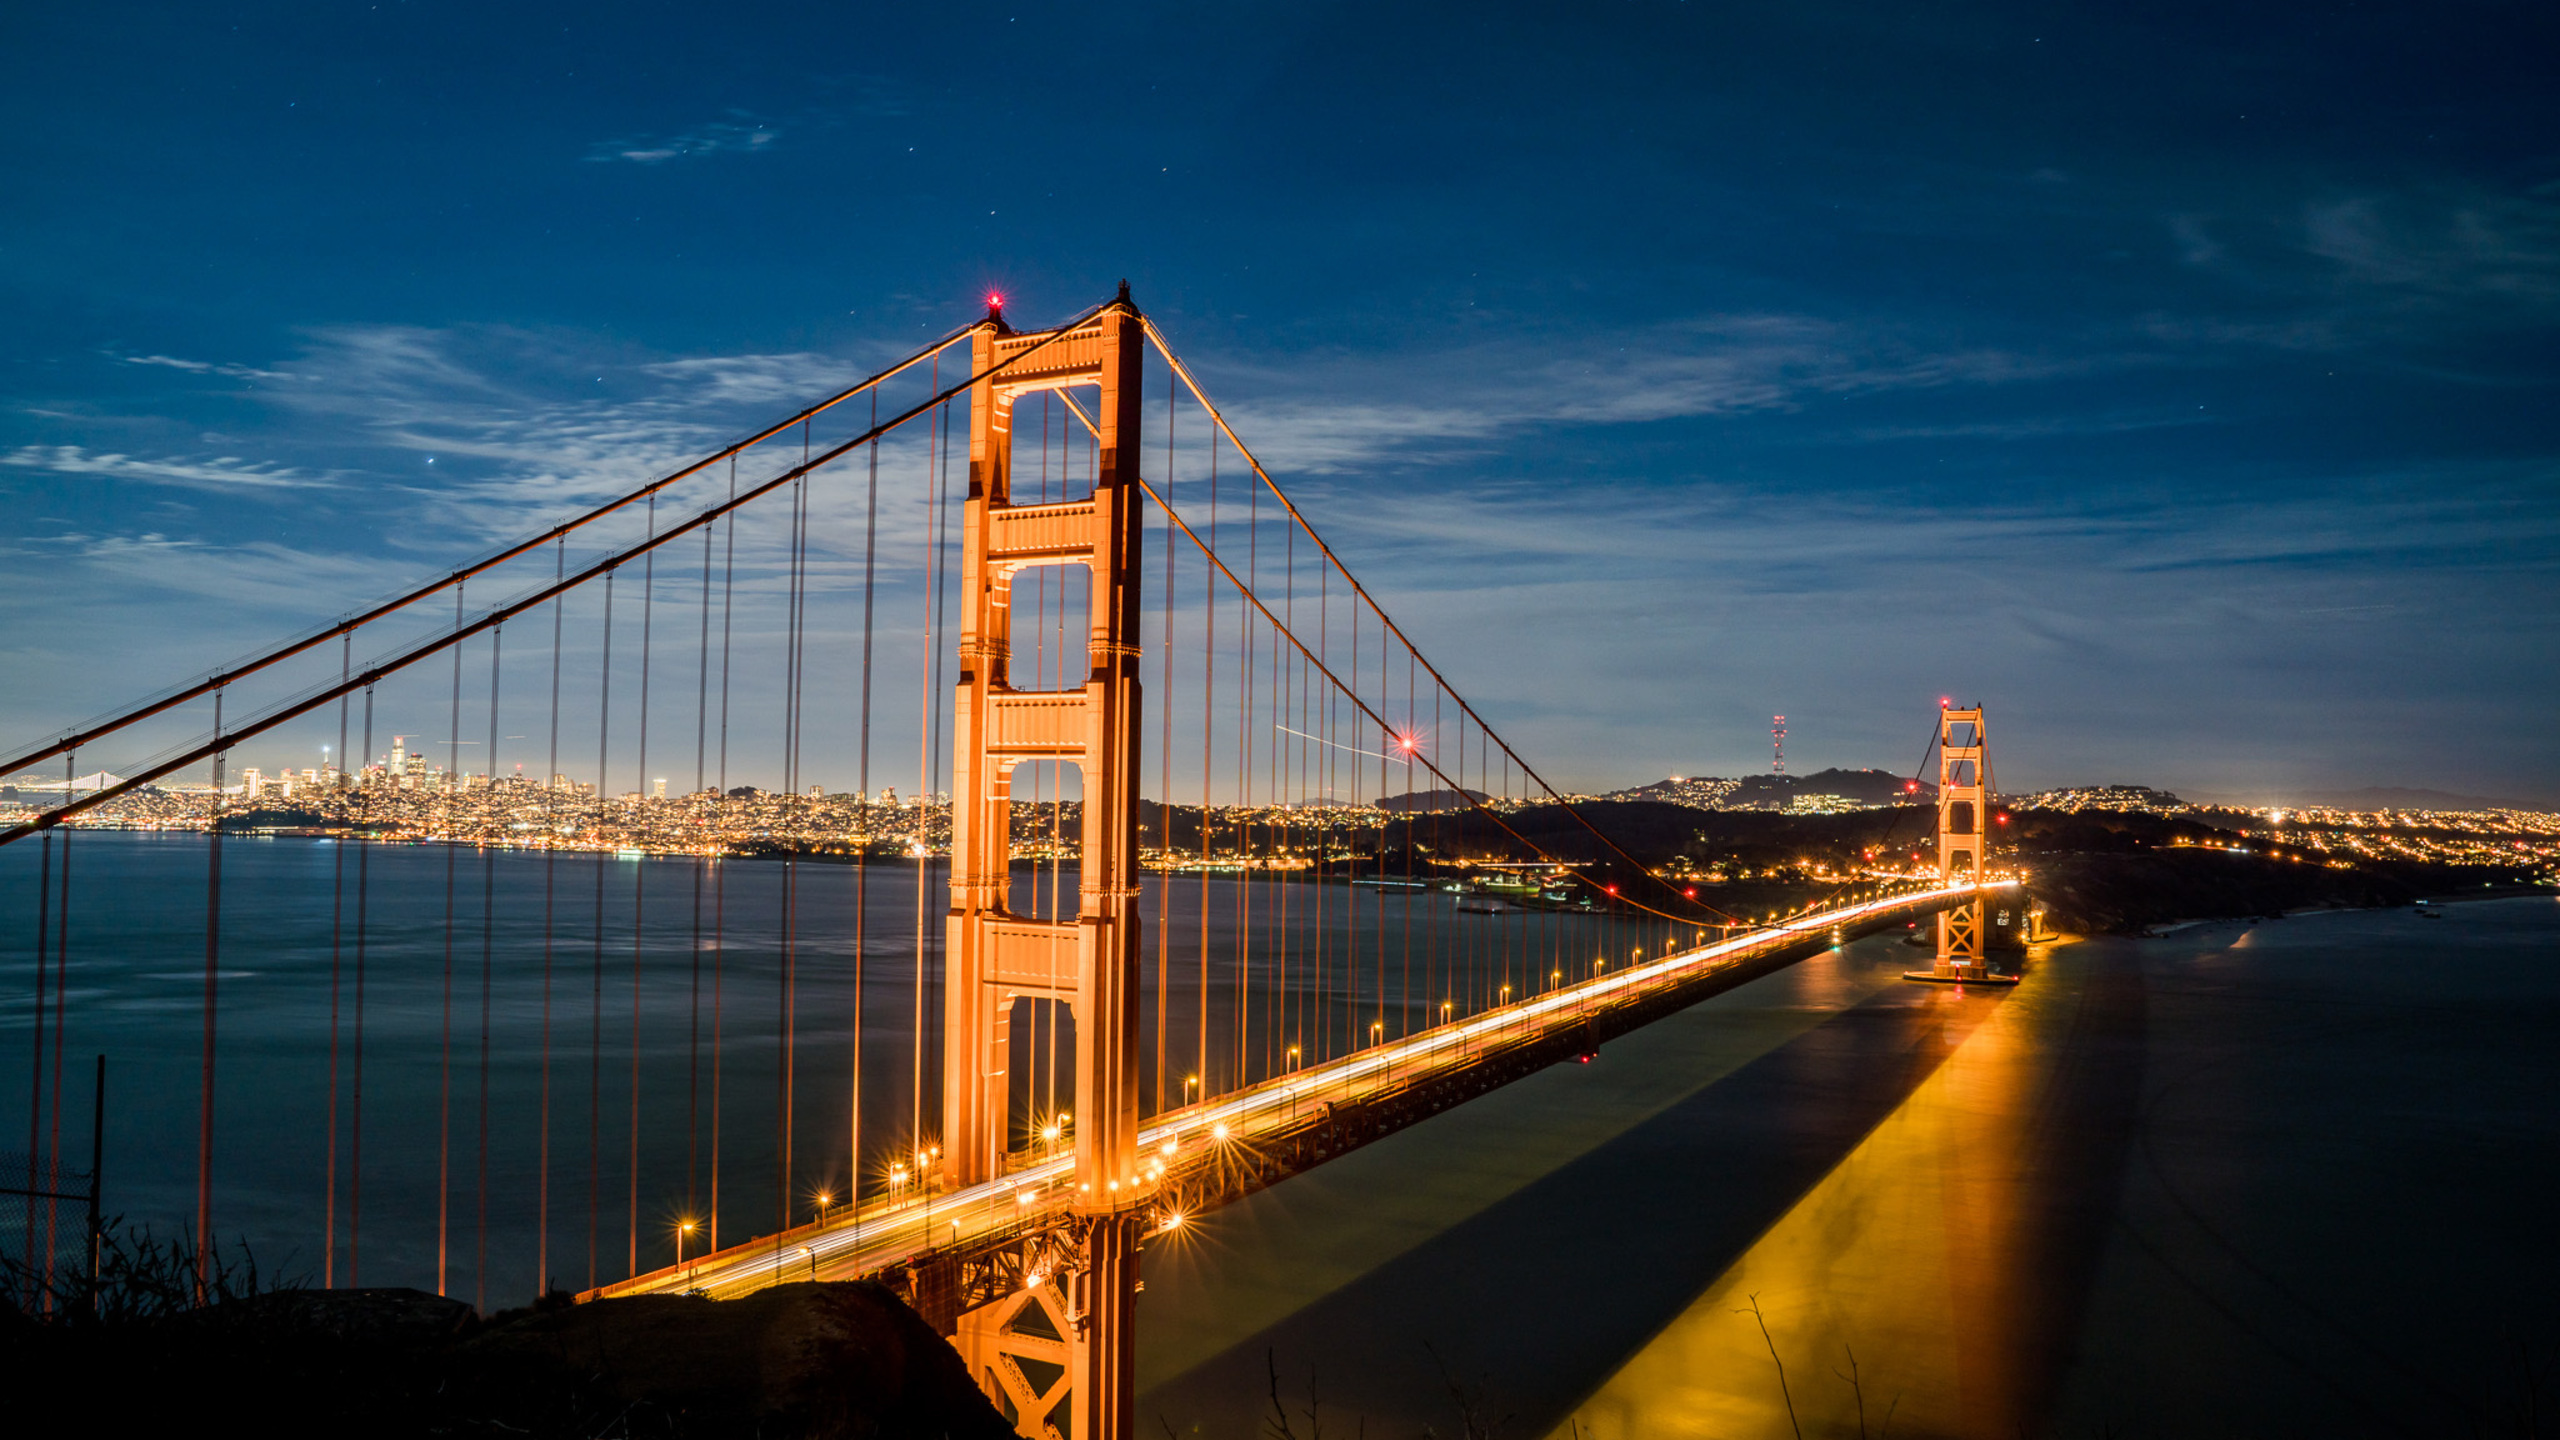 2560x1440 Golden Gate Bridge 1440P Resolution HD 4k ...